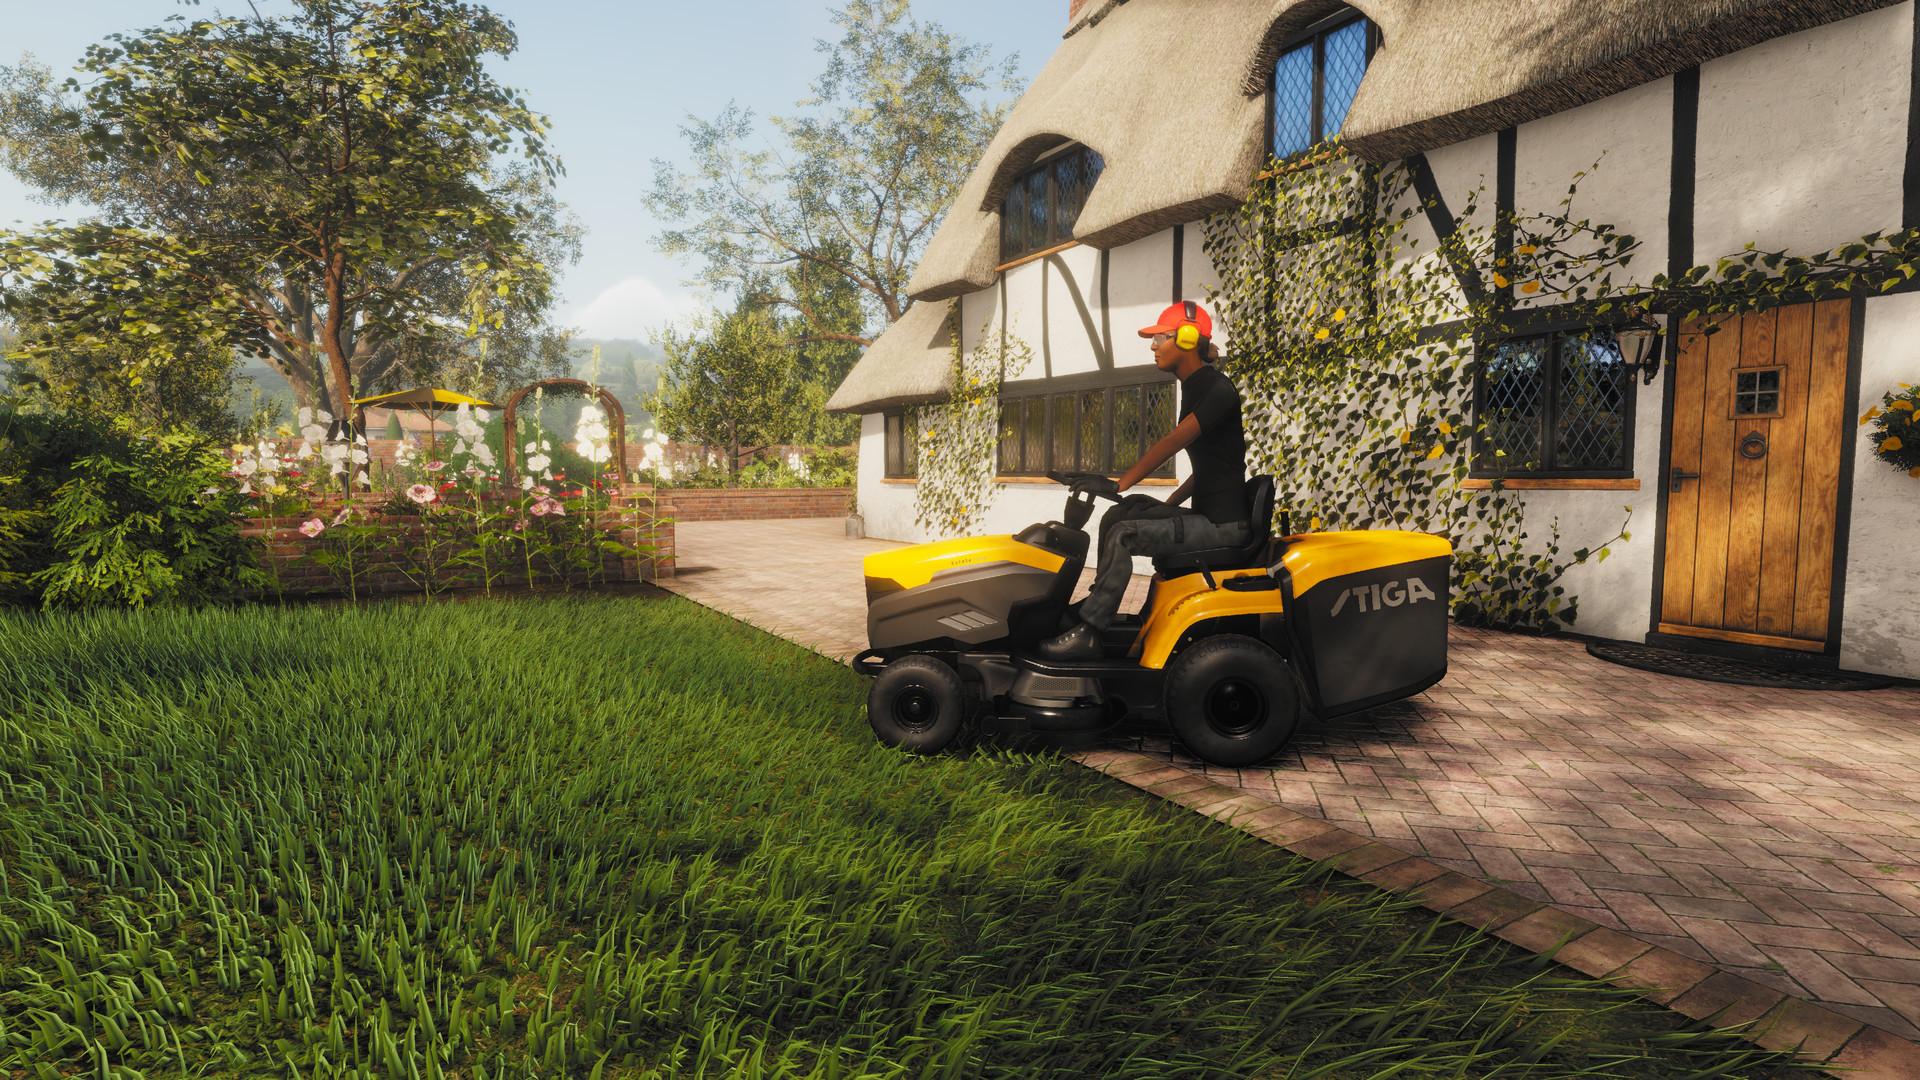 Xbox Series X & S Lawn Mowing Simulator